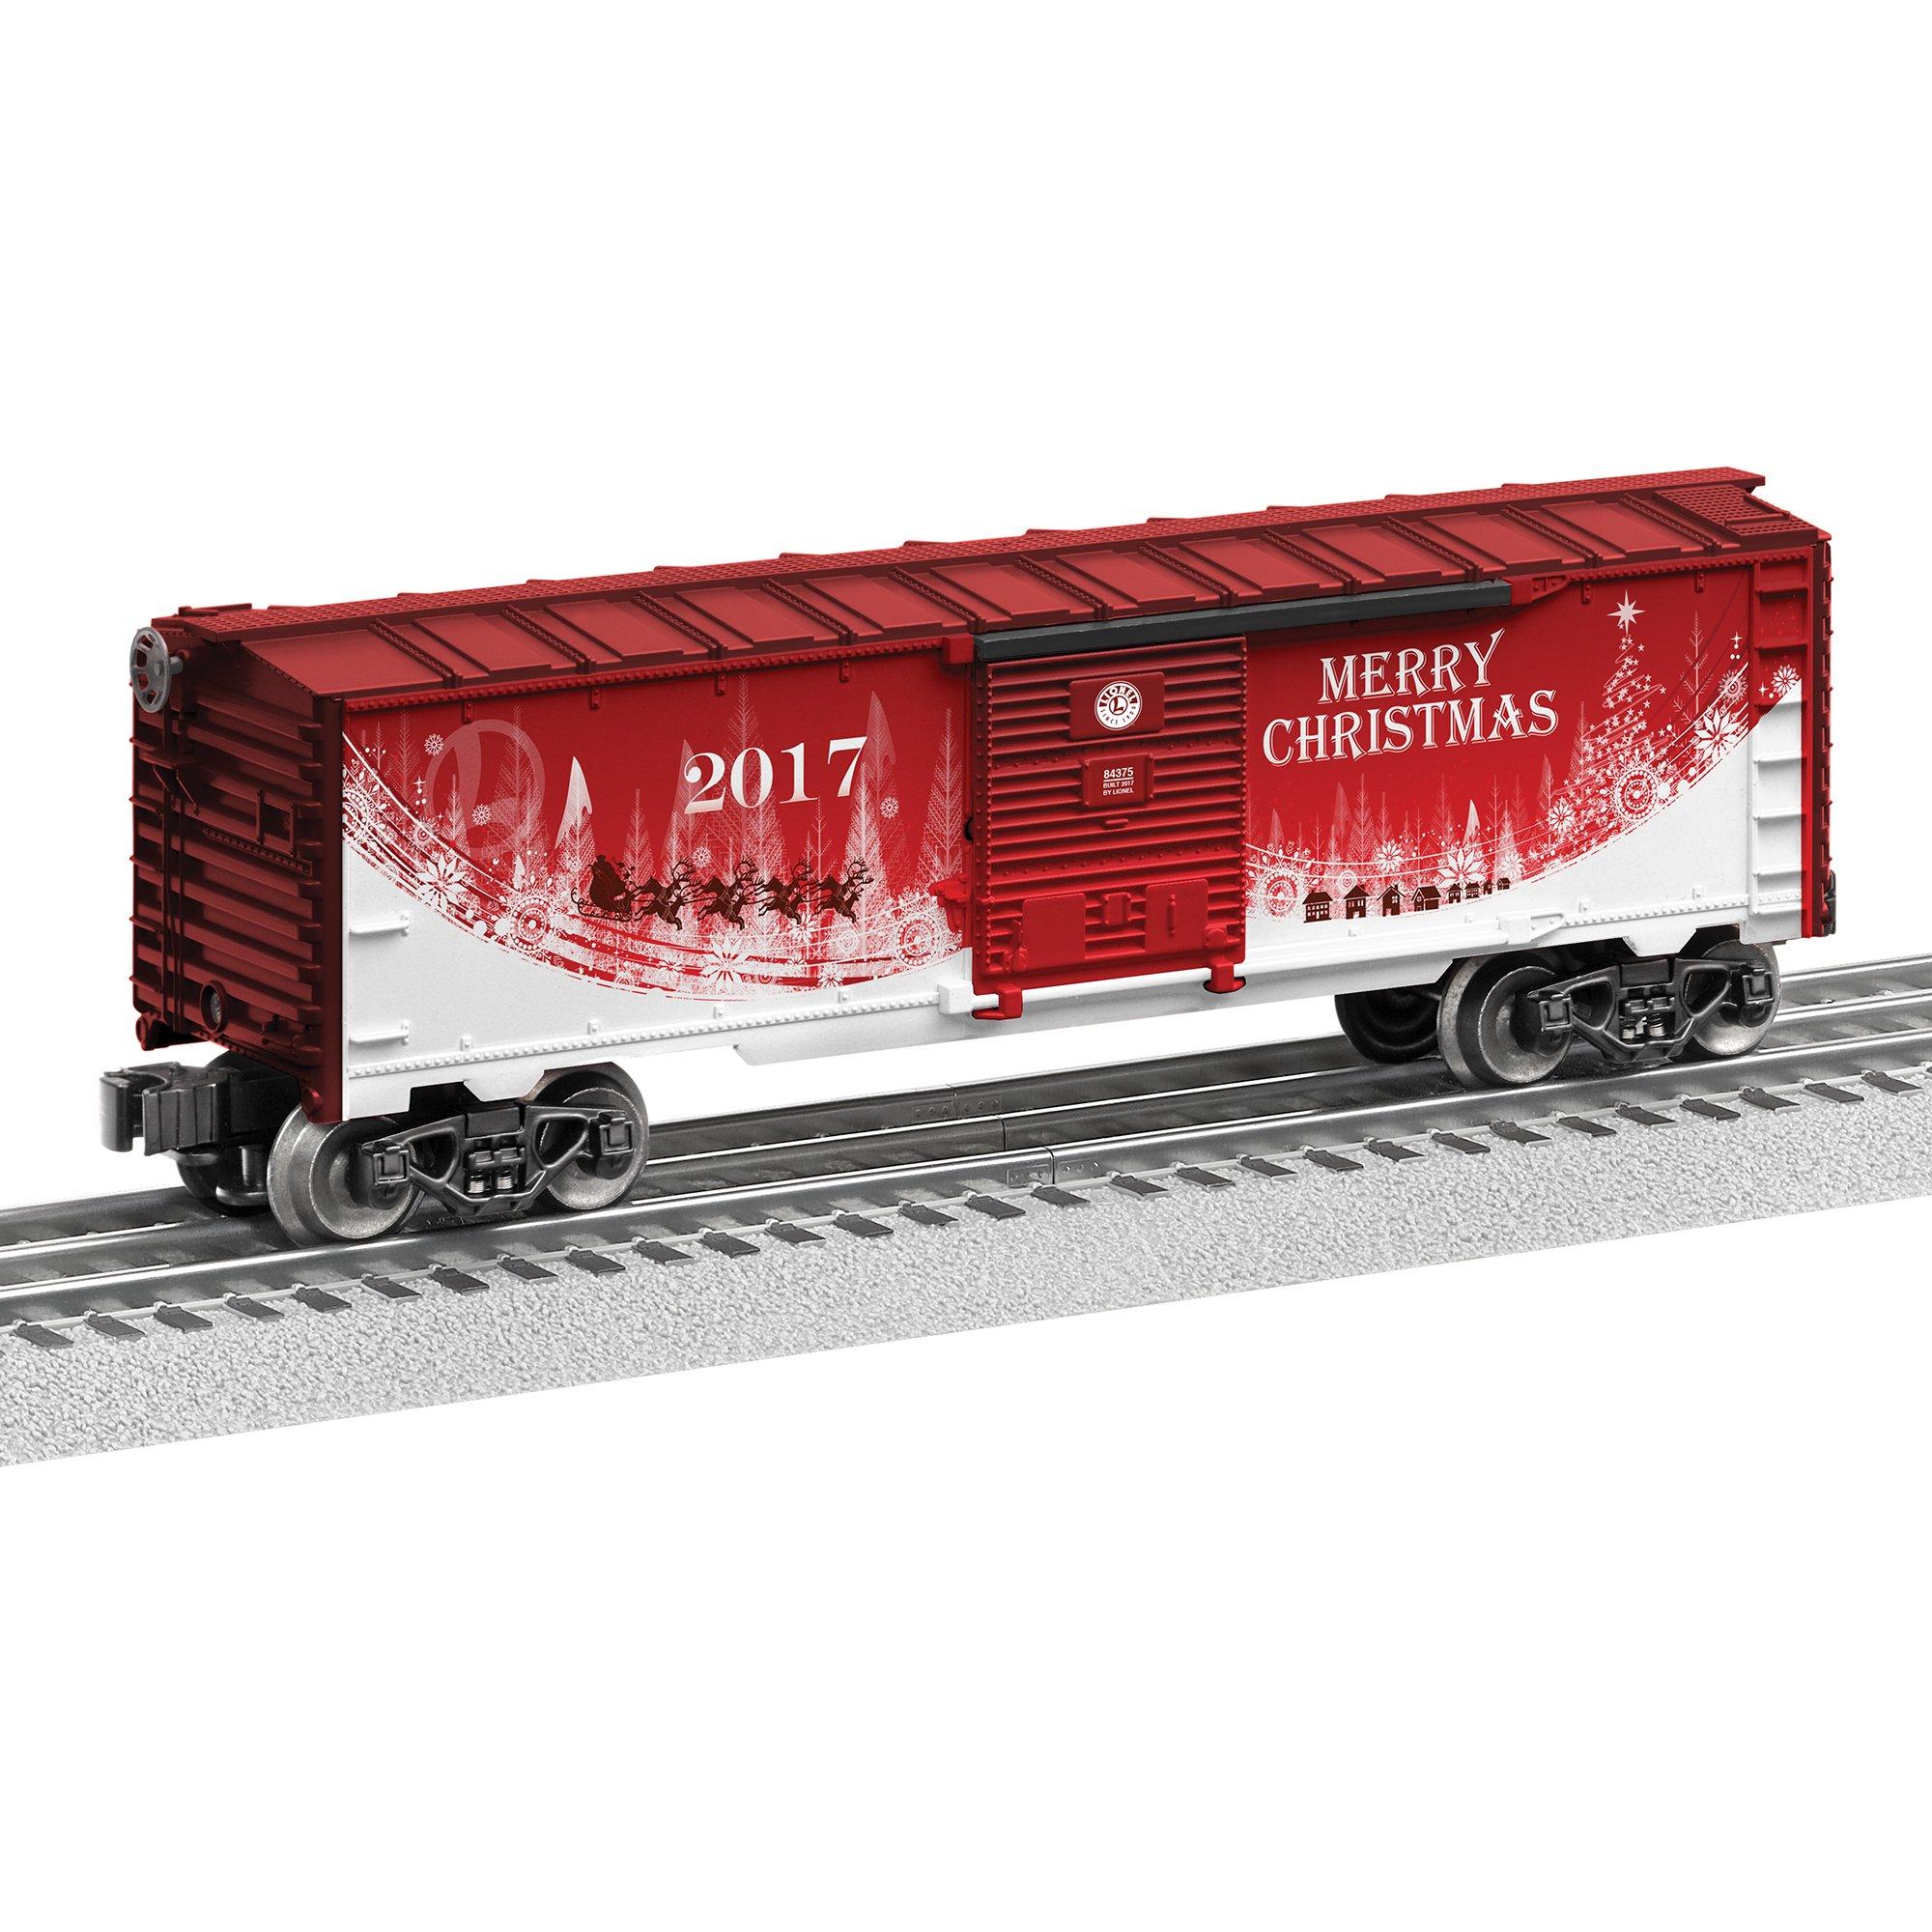 Lionel 2017 Christmas Boxcar Train